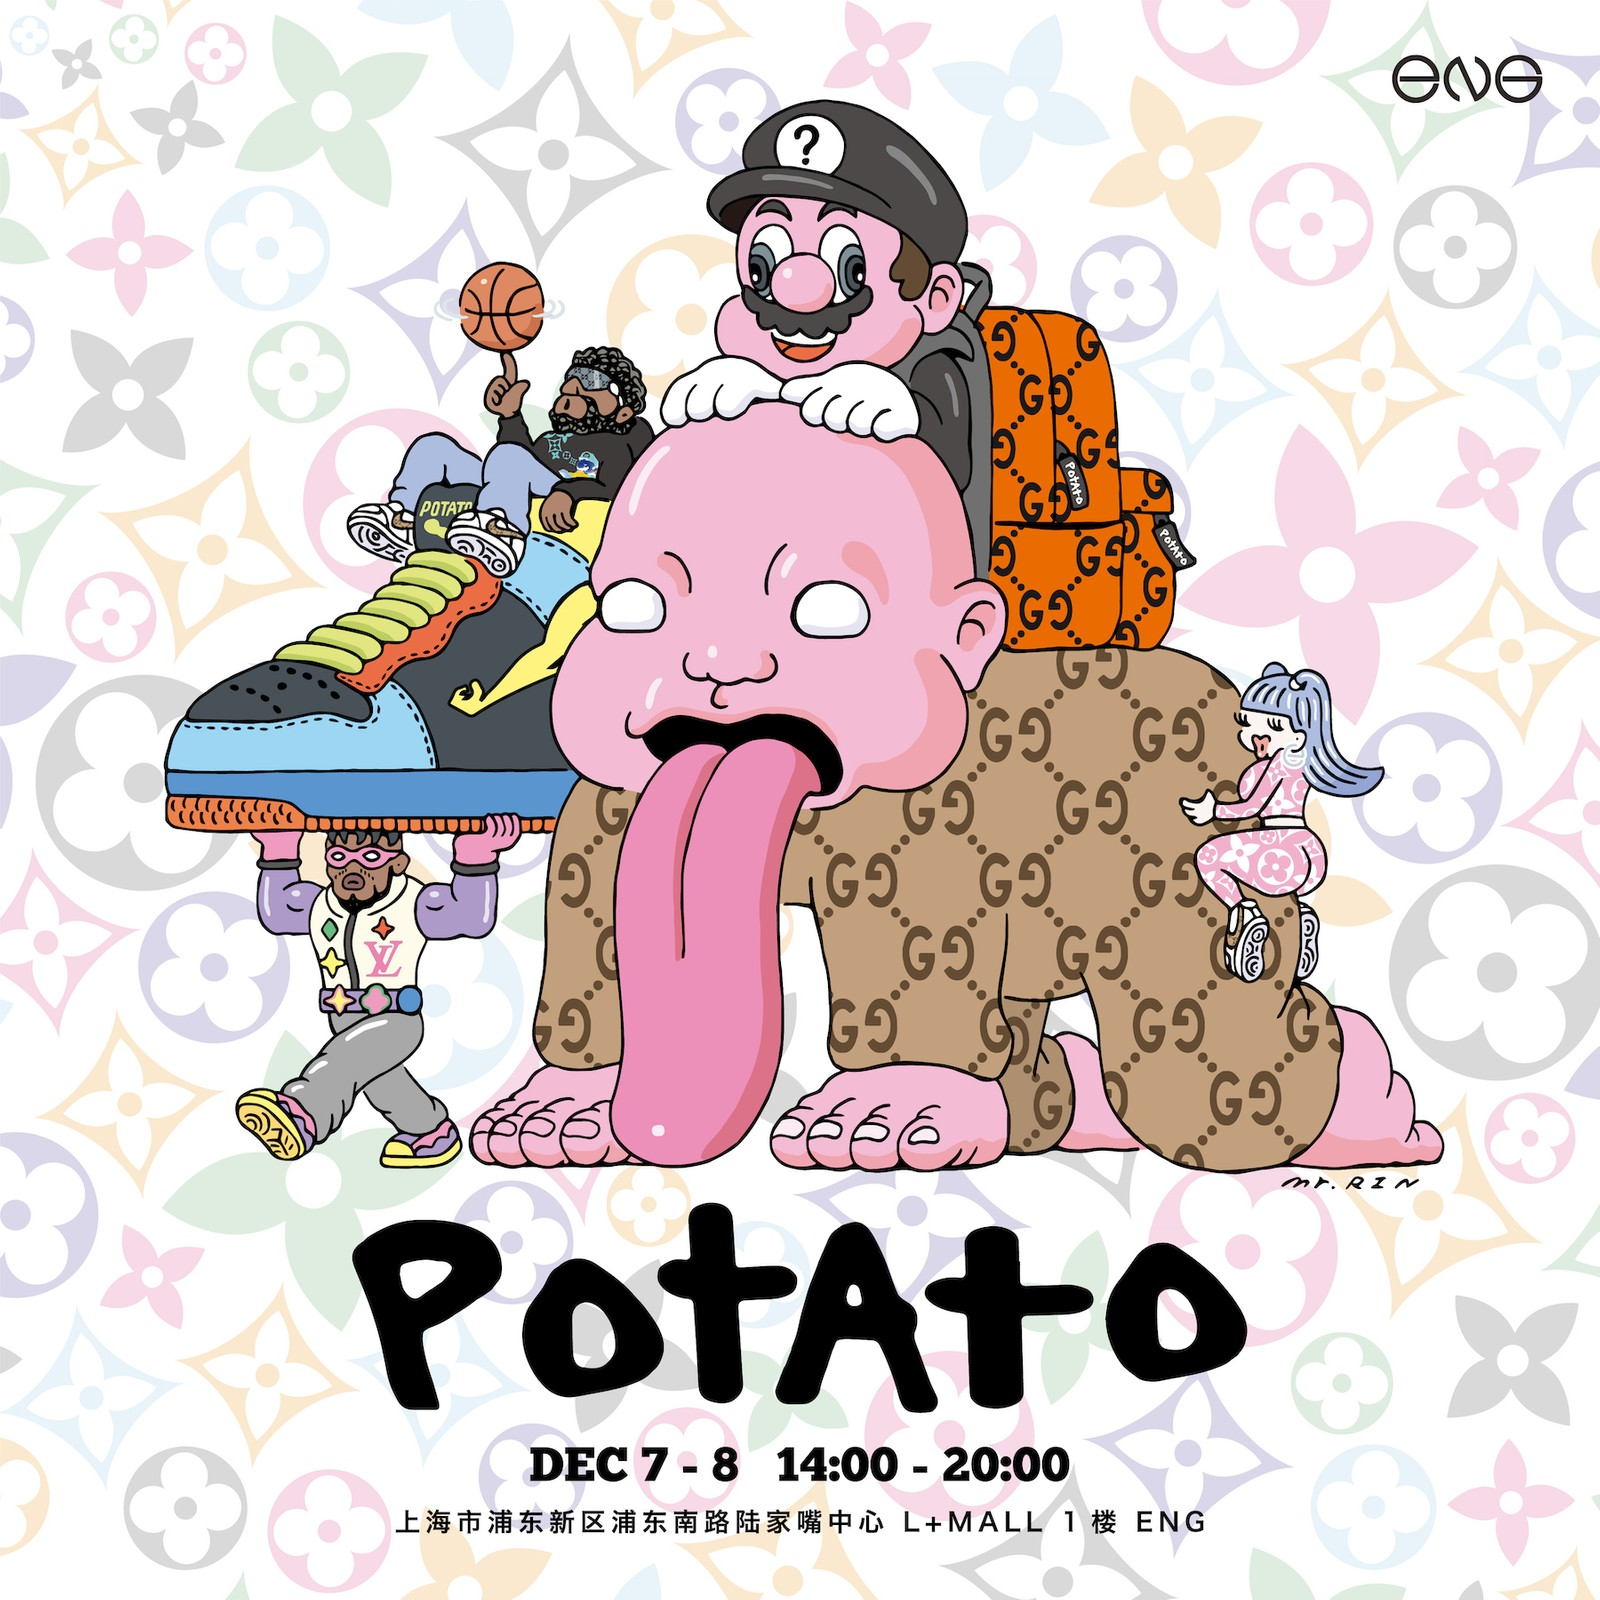 Imran Potato 2019 秋冬系列正式發佈